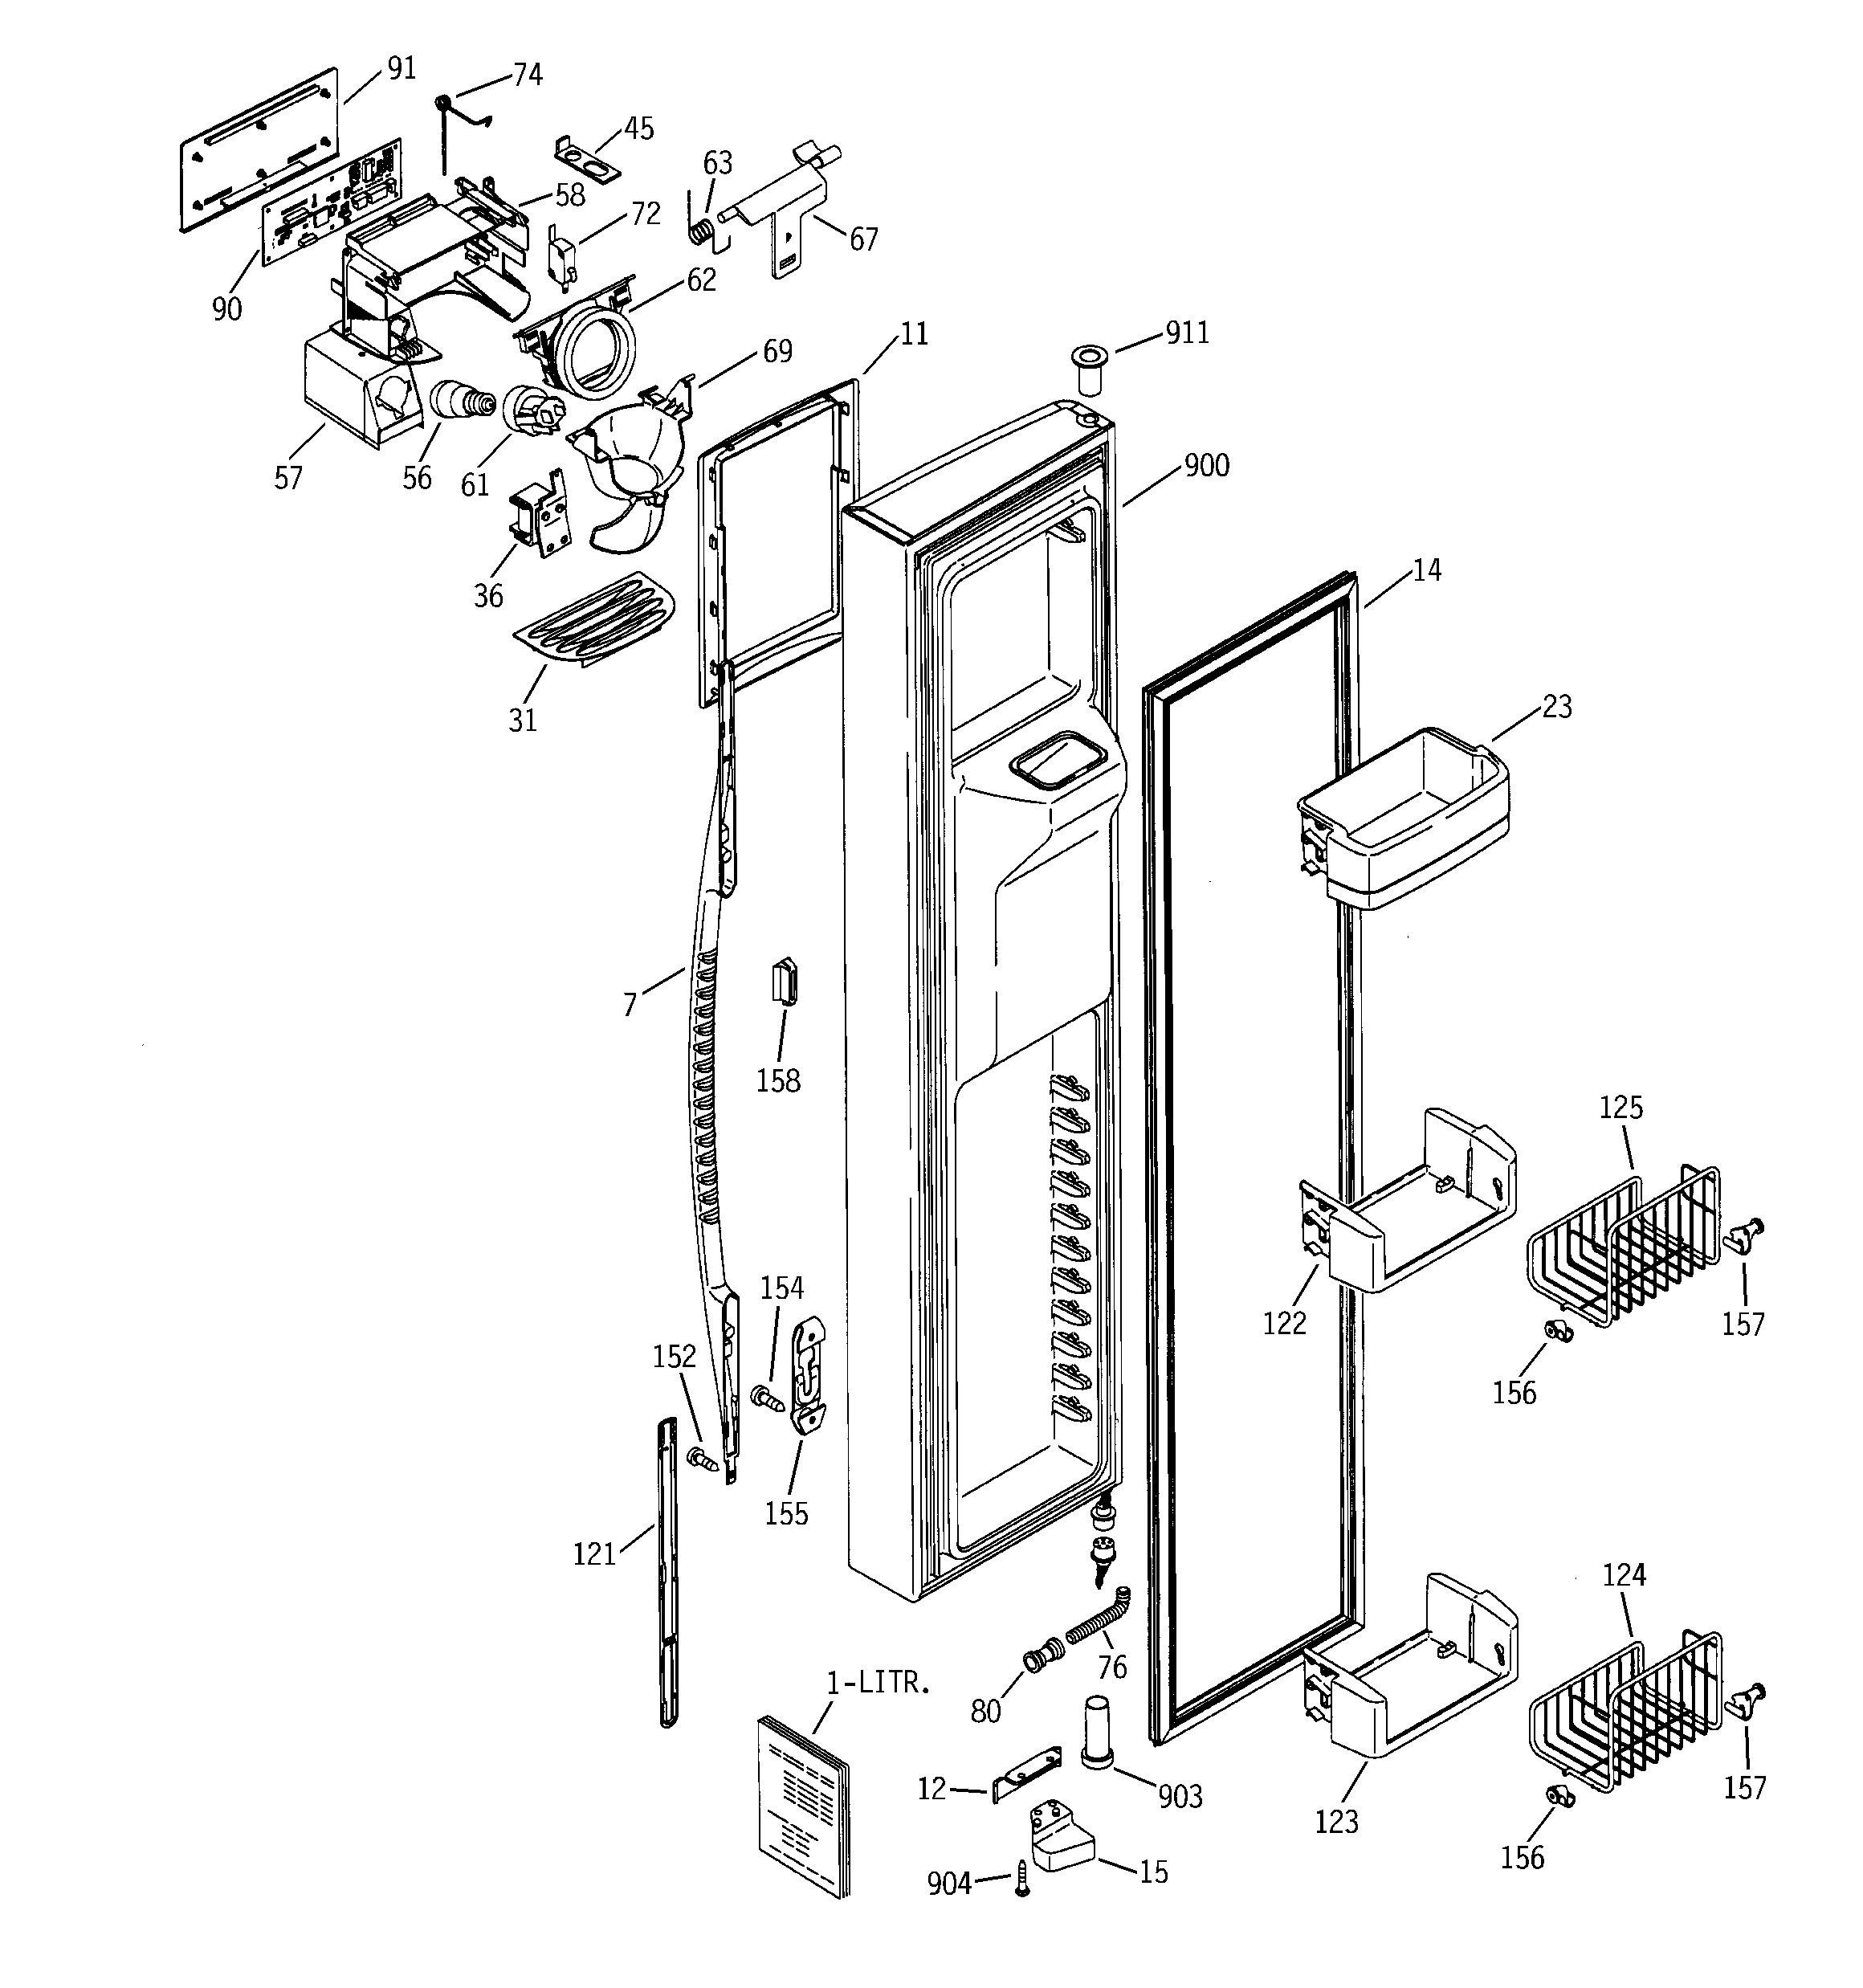 Ge Ice Maker Wiring Diagram 2018 Wiring Diagram Bosch Dishwasher Simple Ge Refrigerator Wiring